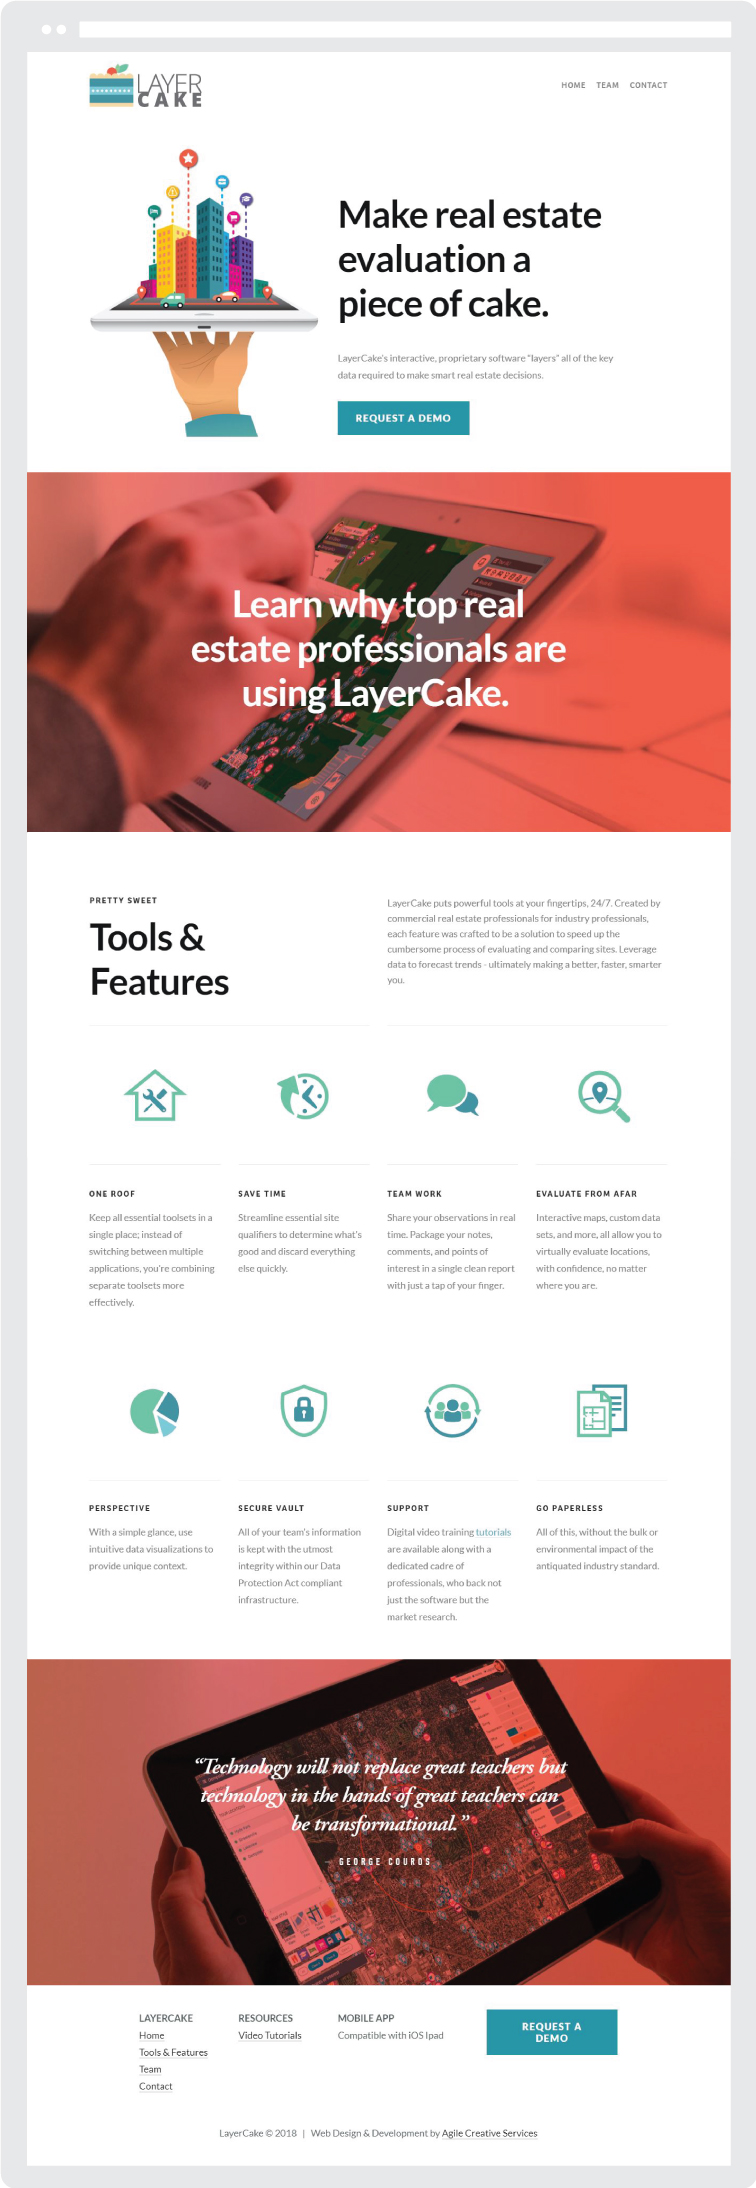 LayerCake_Case-study-website.jpg